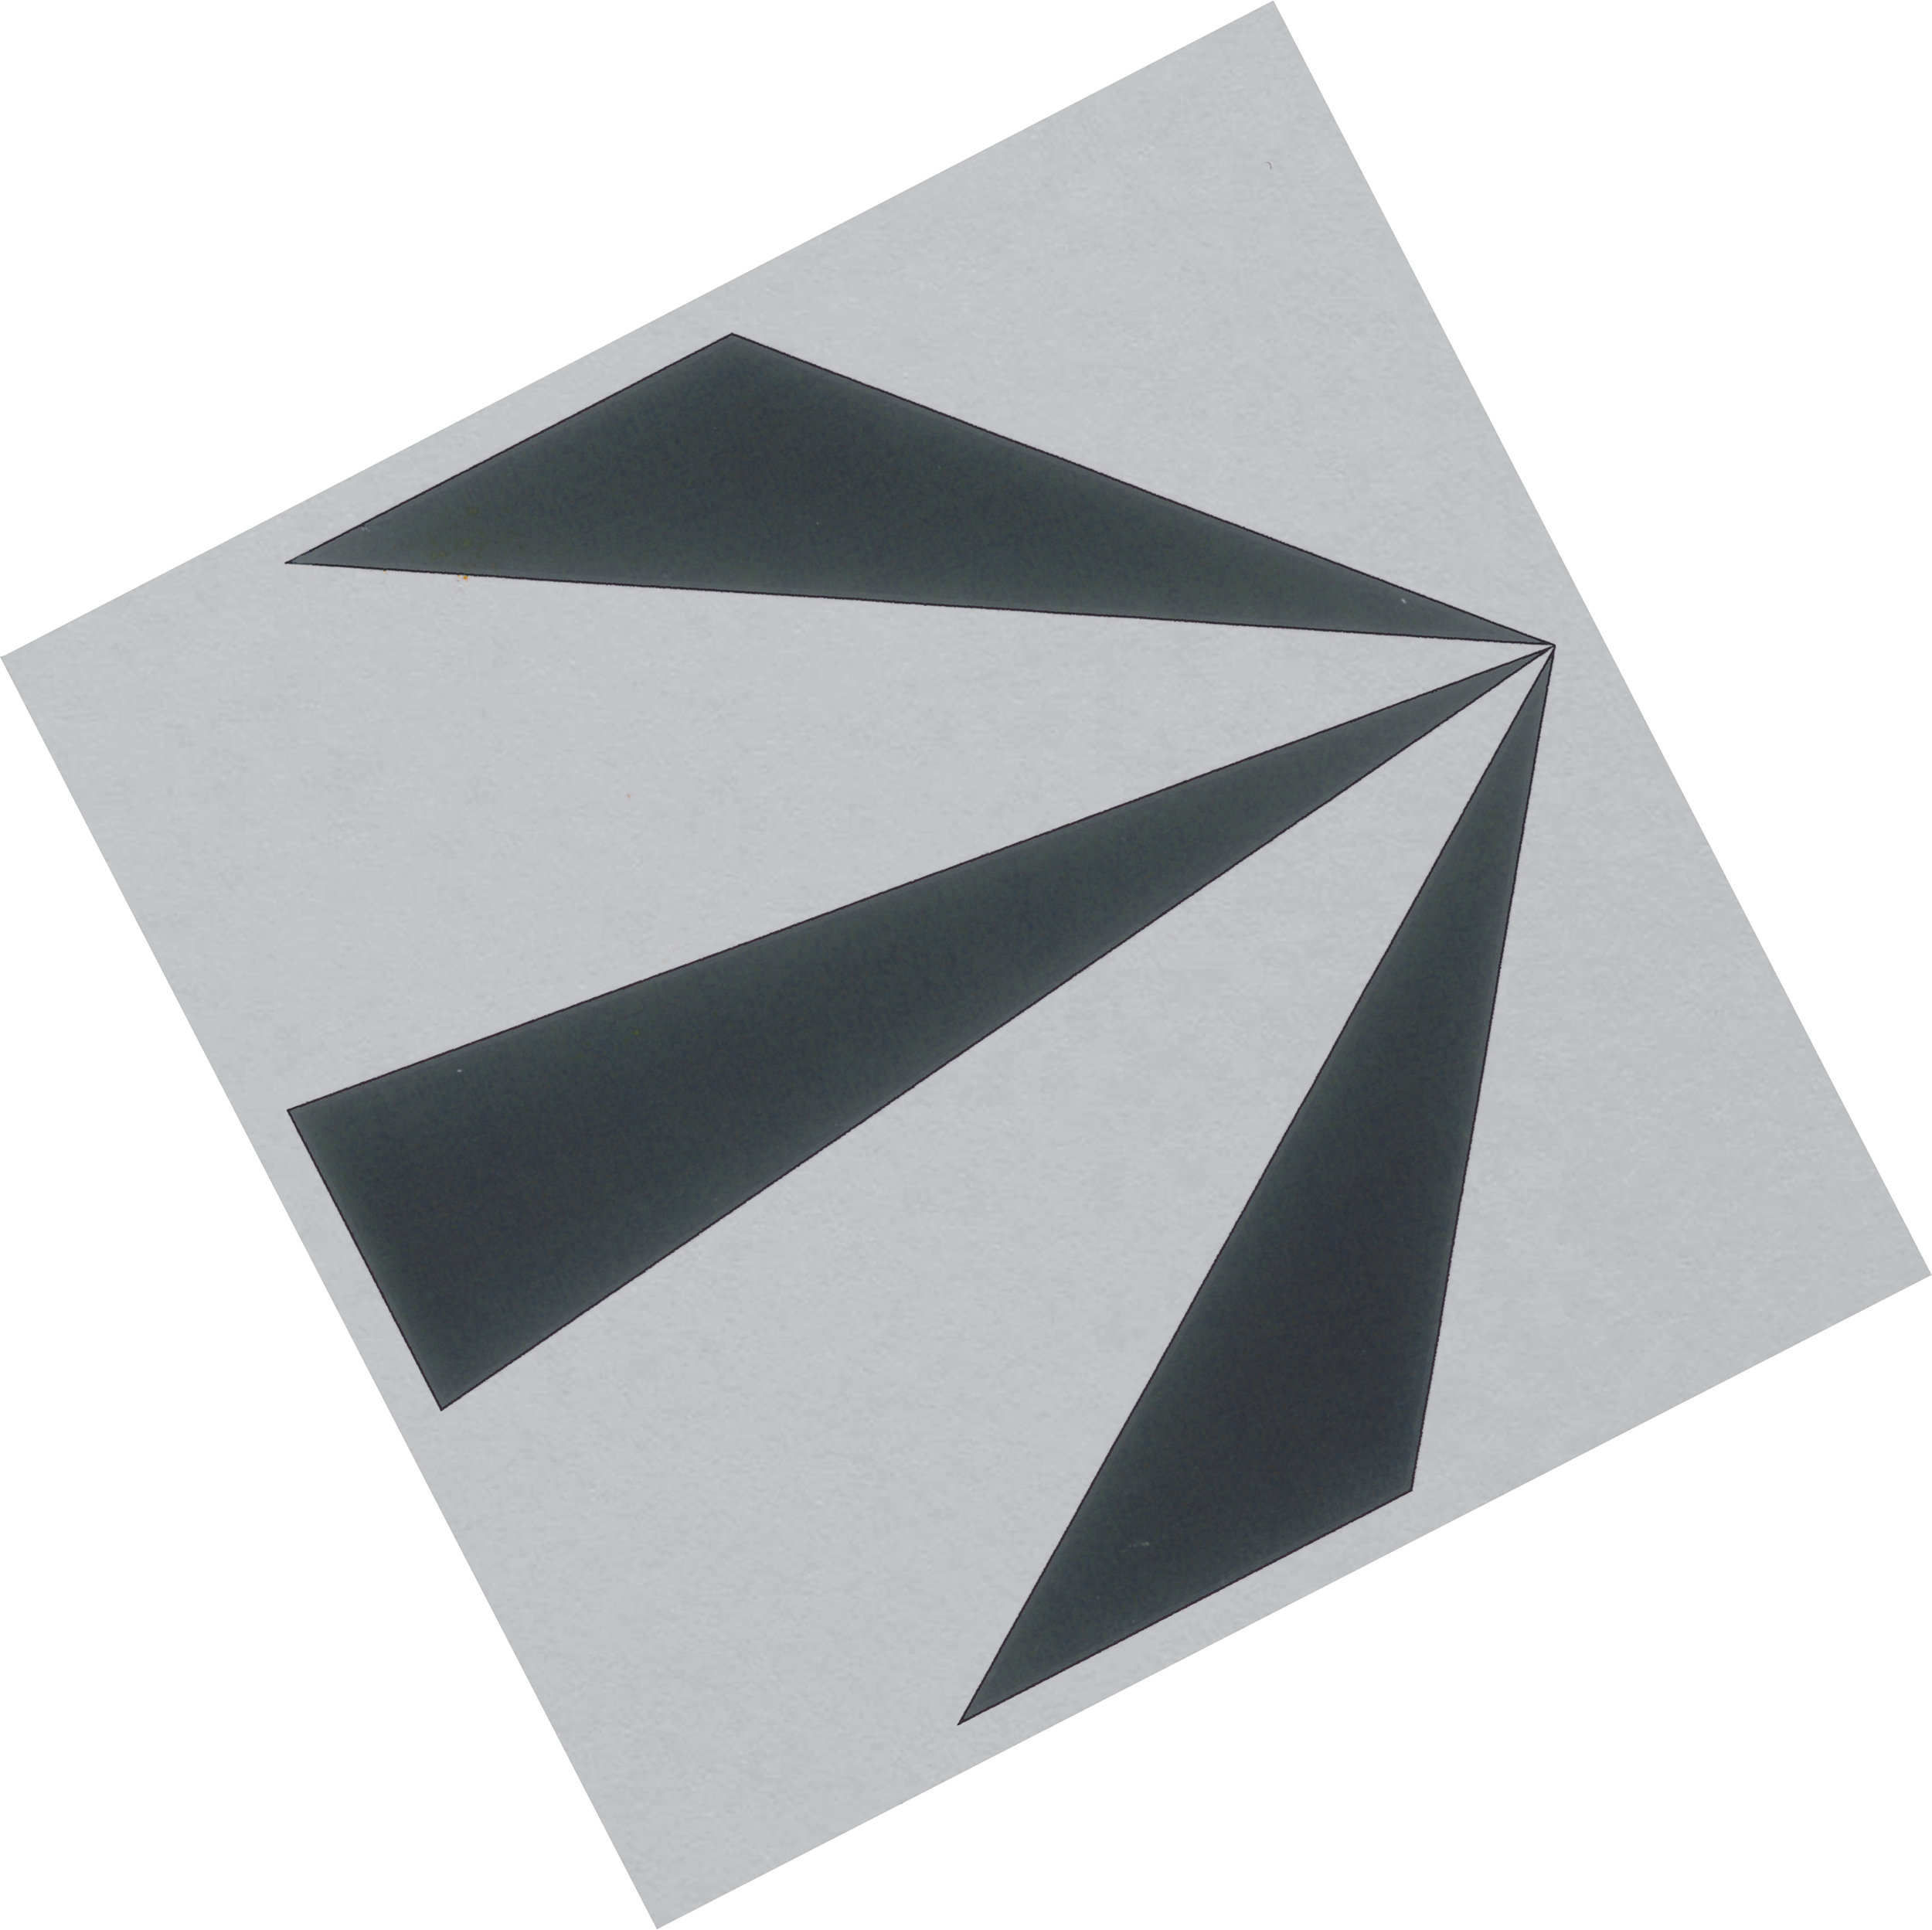 Wayfinding arrow